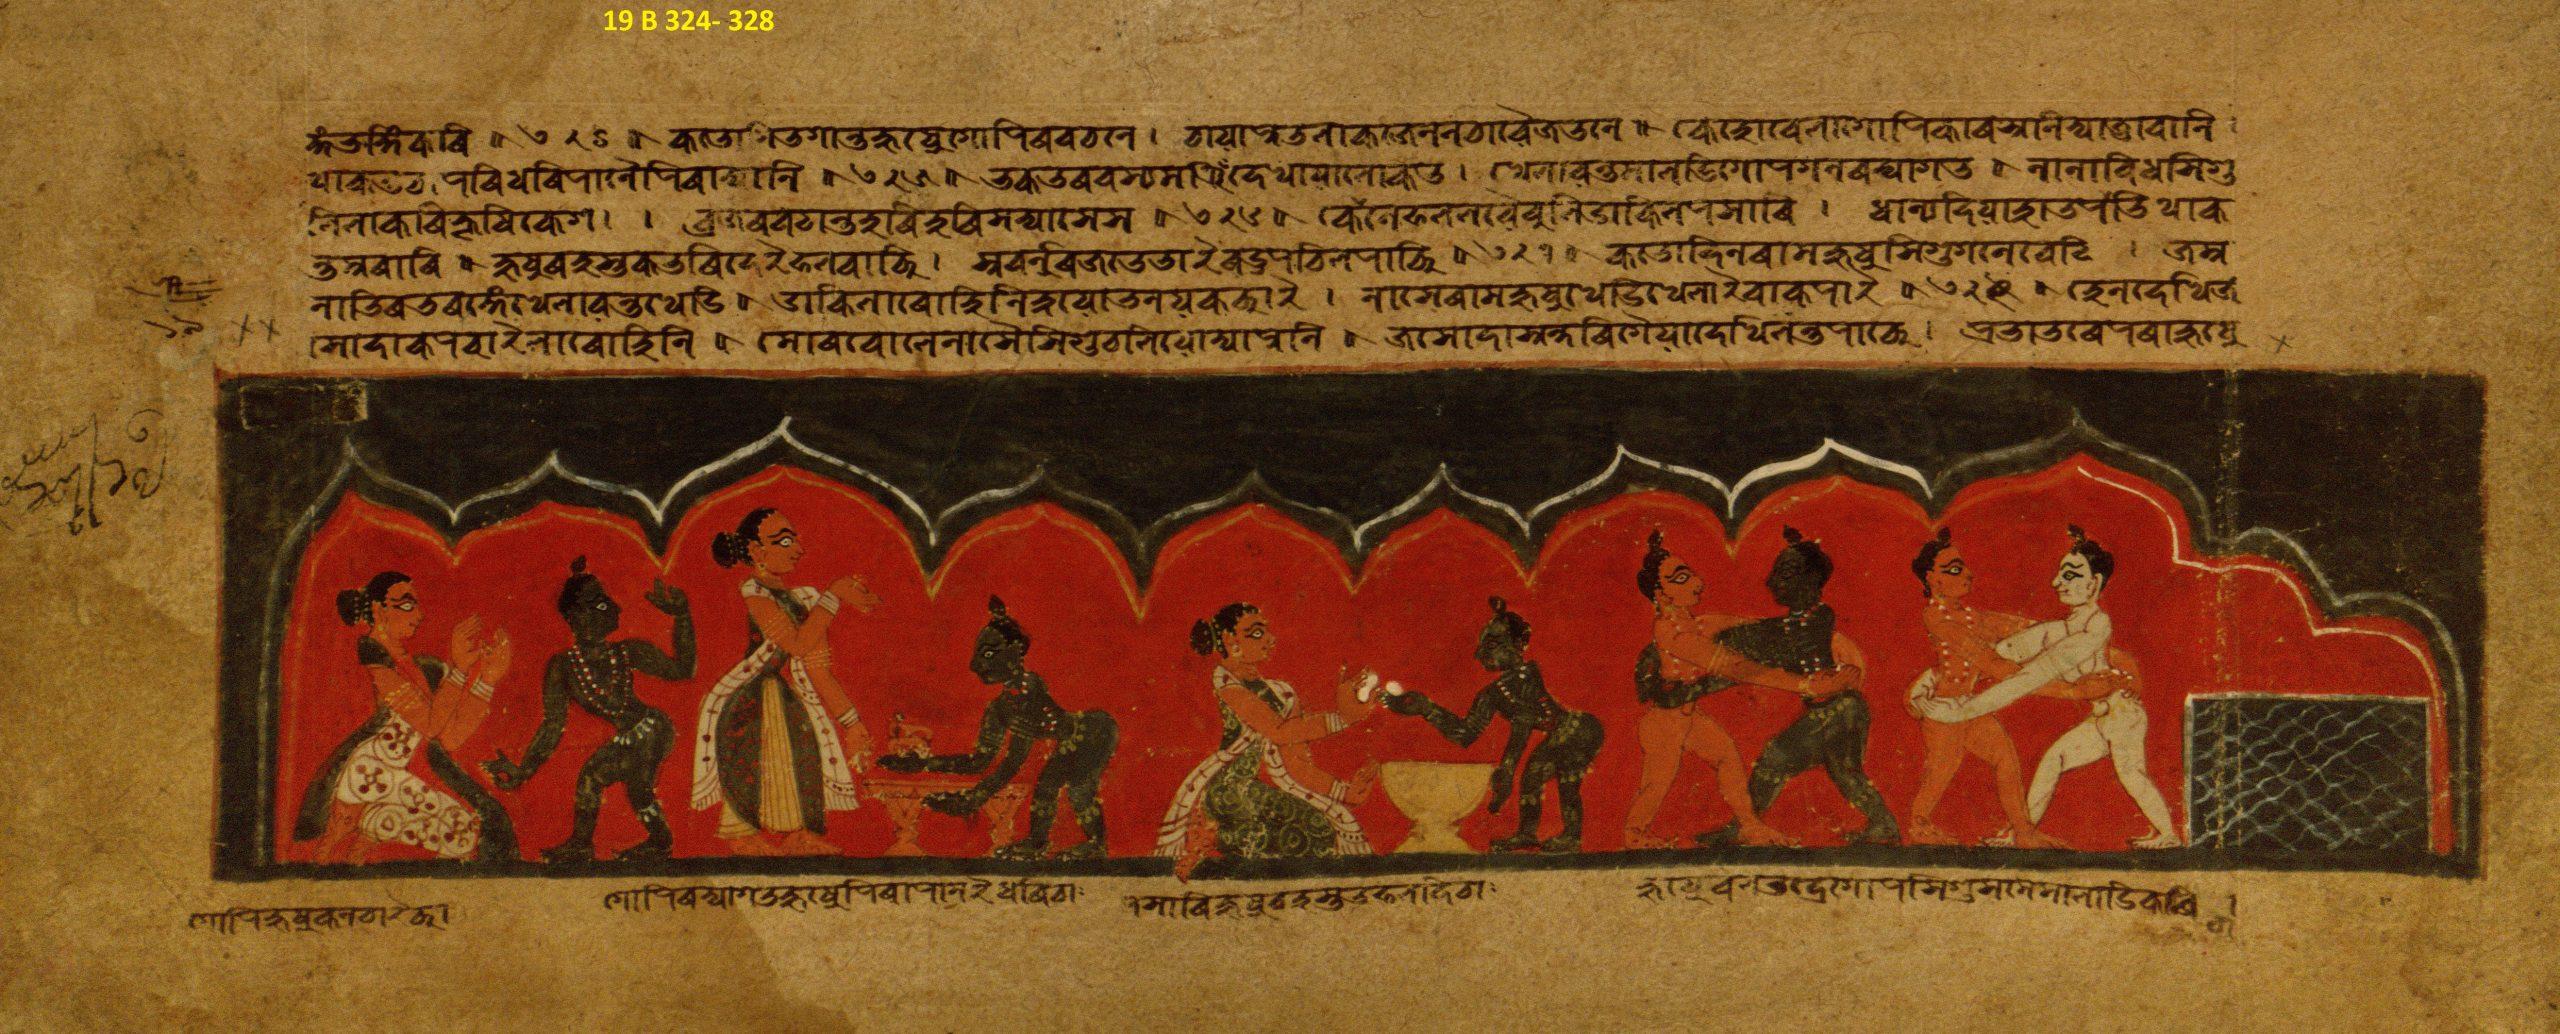 Srimanta Sankaradeva : the pioneer of Symbolism